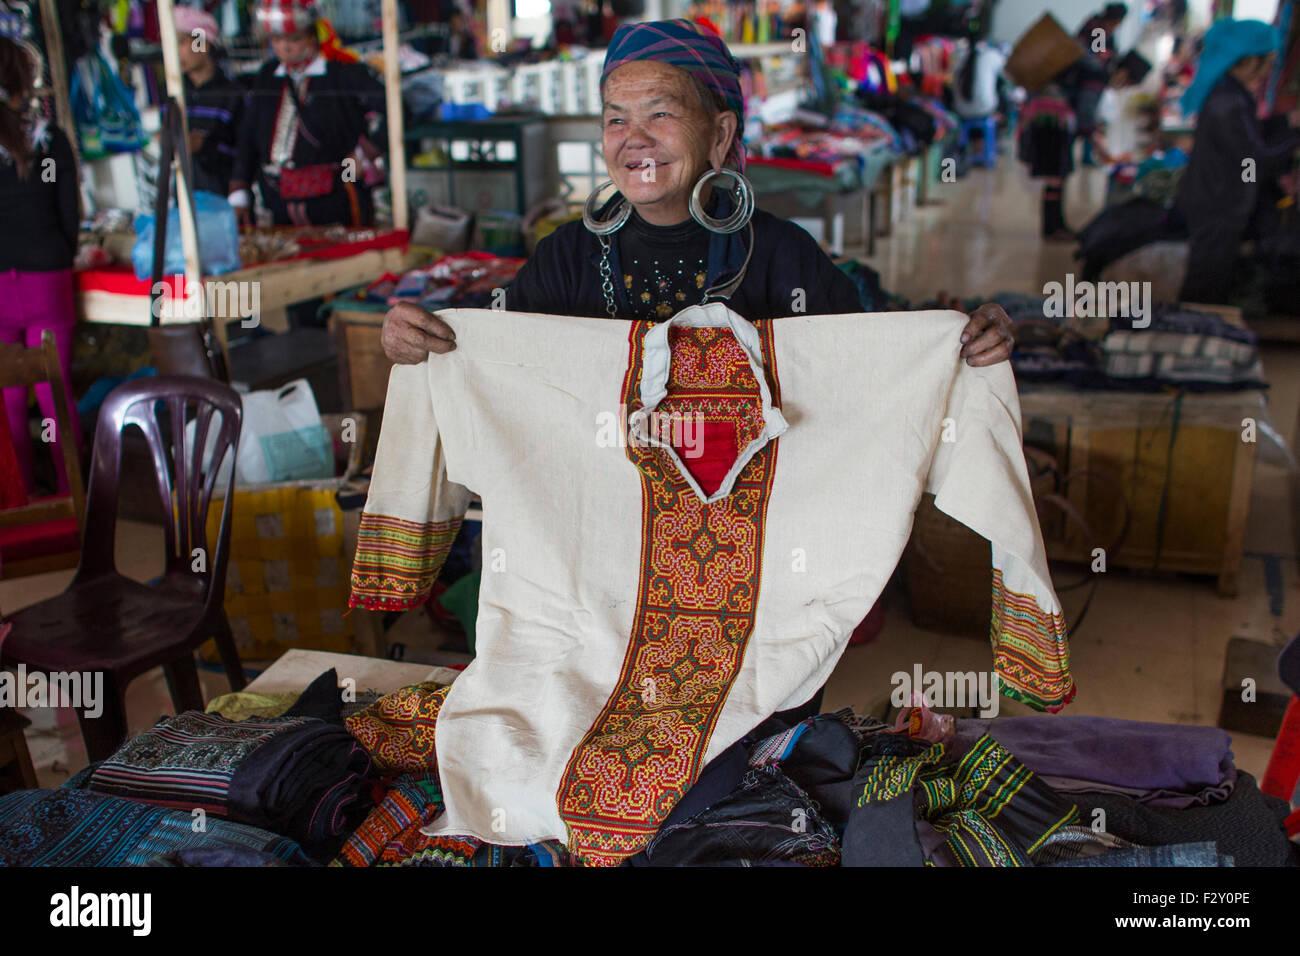 Ethnic Hmong tribe, shopping at Muong Hum market, Vietnam. - Stock Image